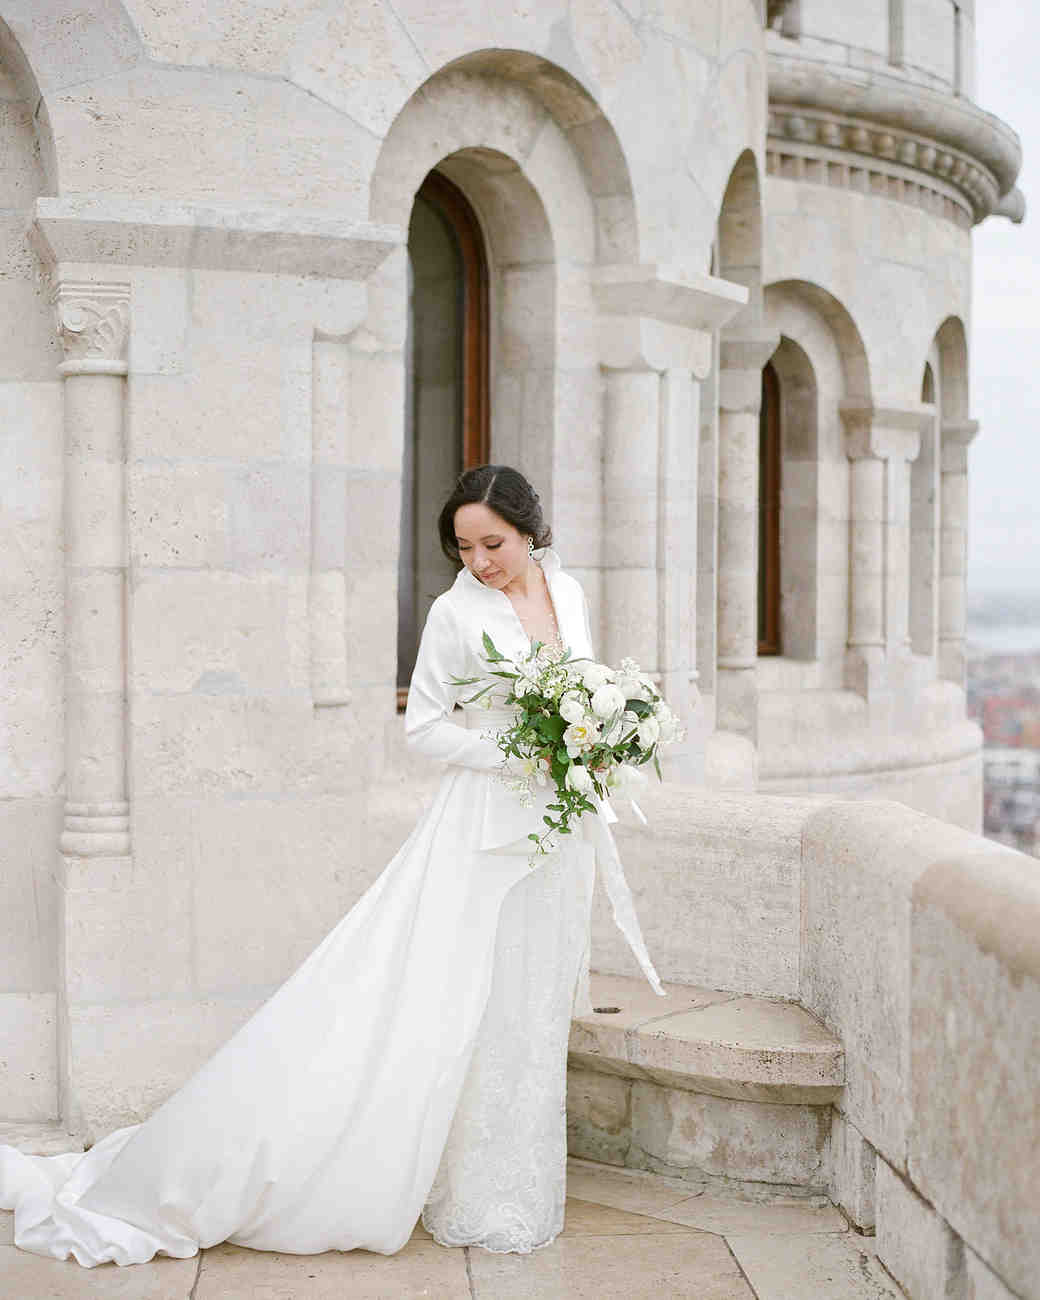 best wedding dresses 2018 diana alex long sleeve white